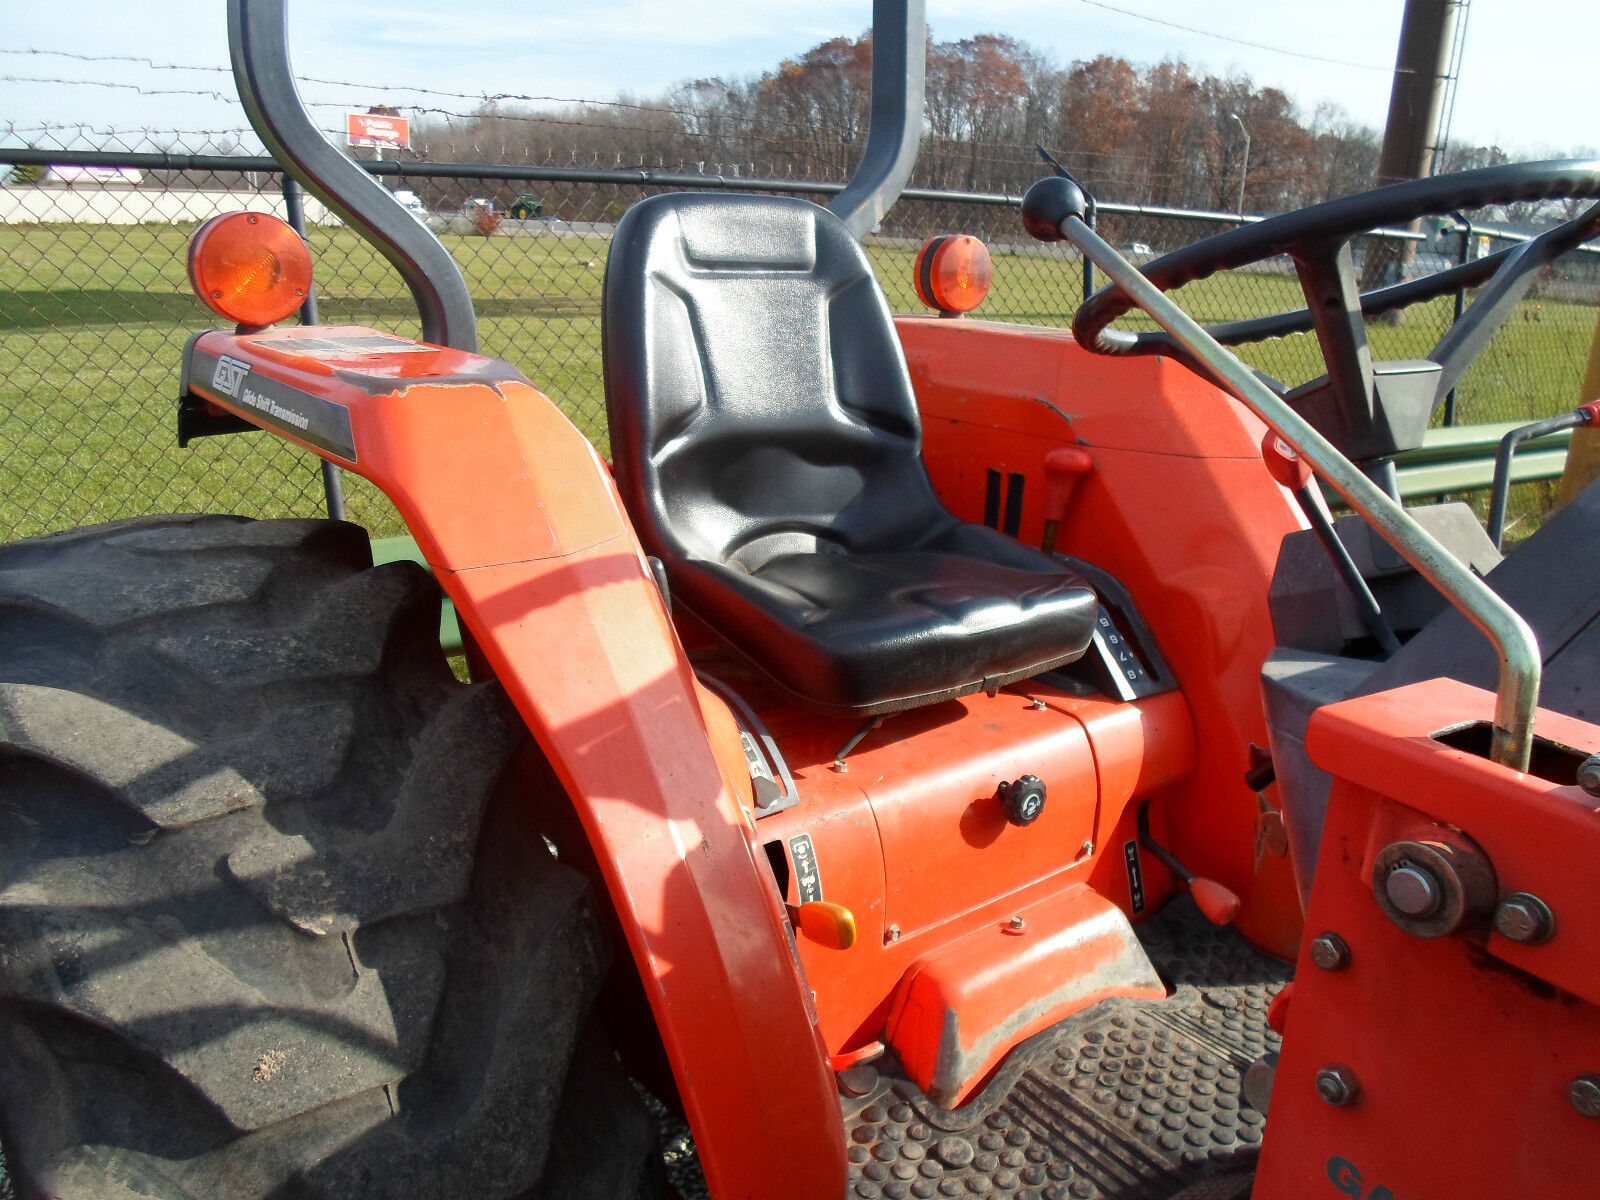 Nueva Alto Asiento Trasero Para Kubota Compacto tractores b7410, B7510, B7610  ir